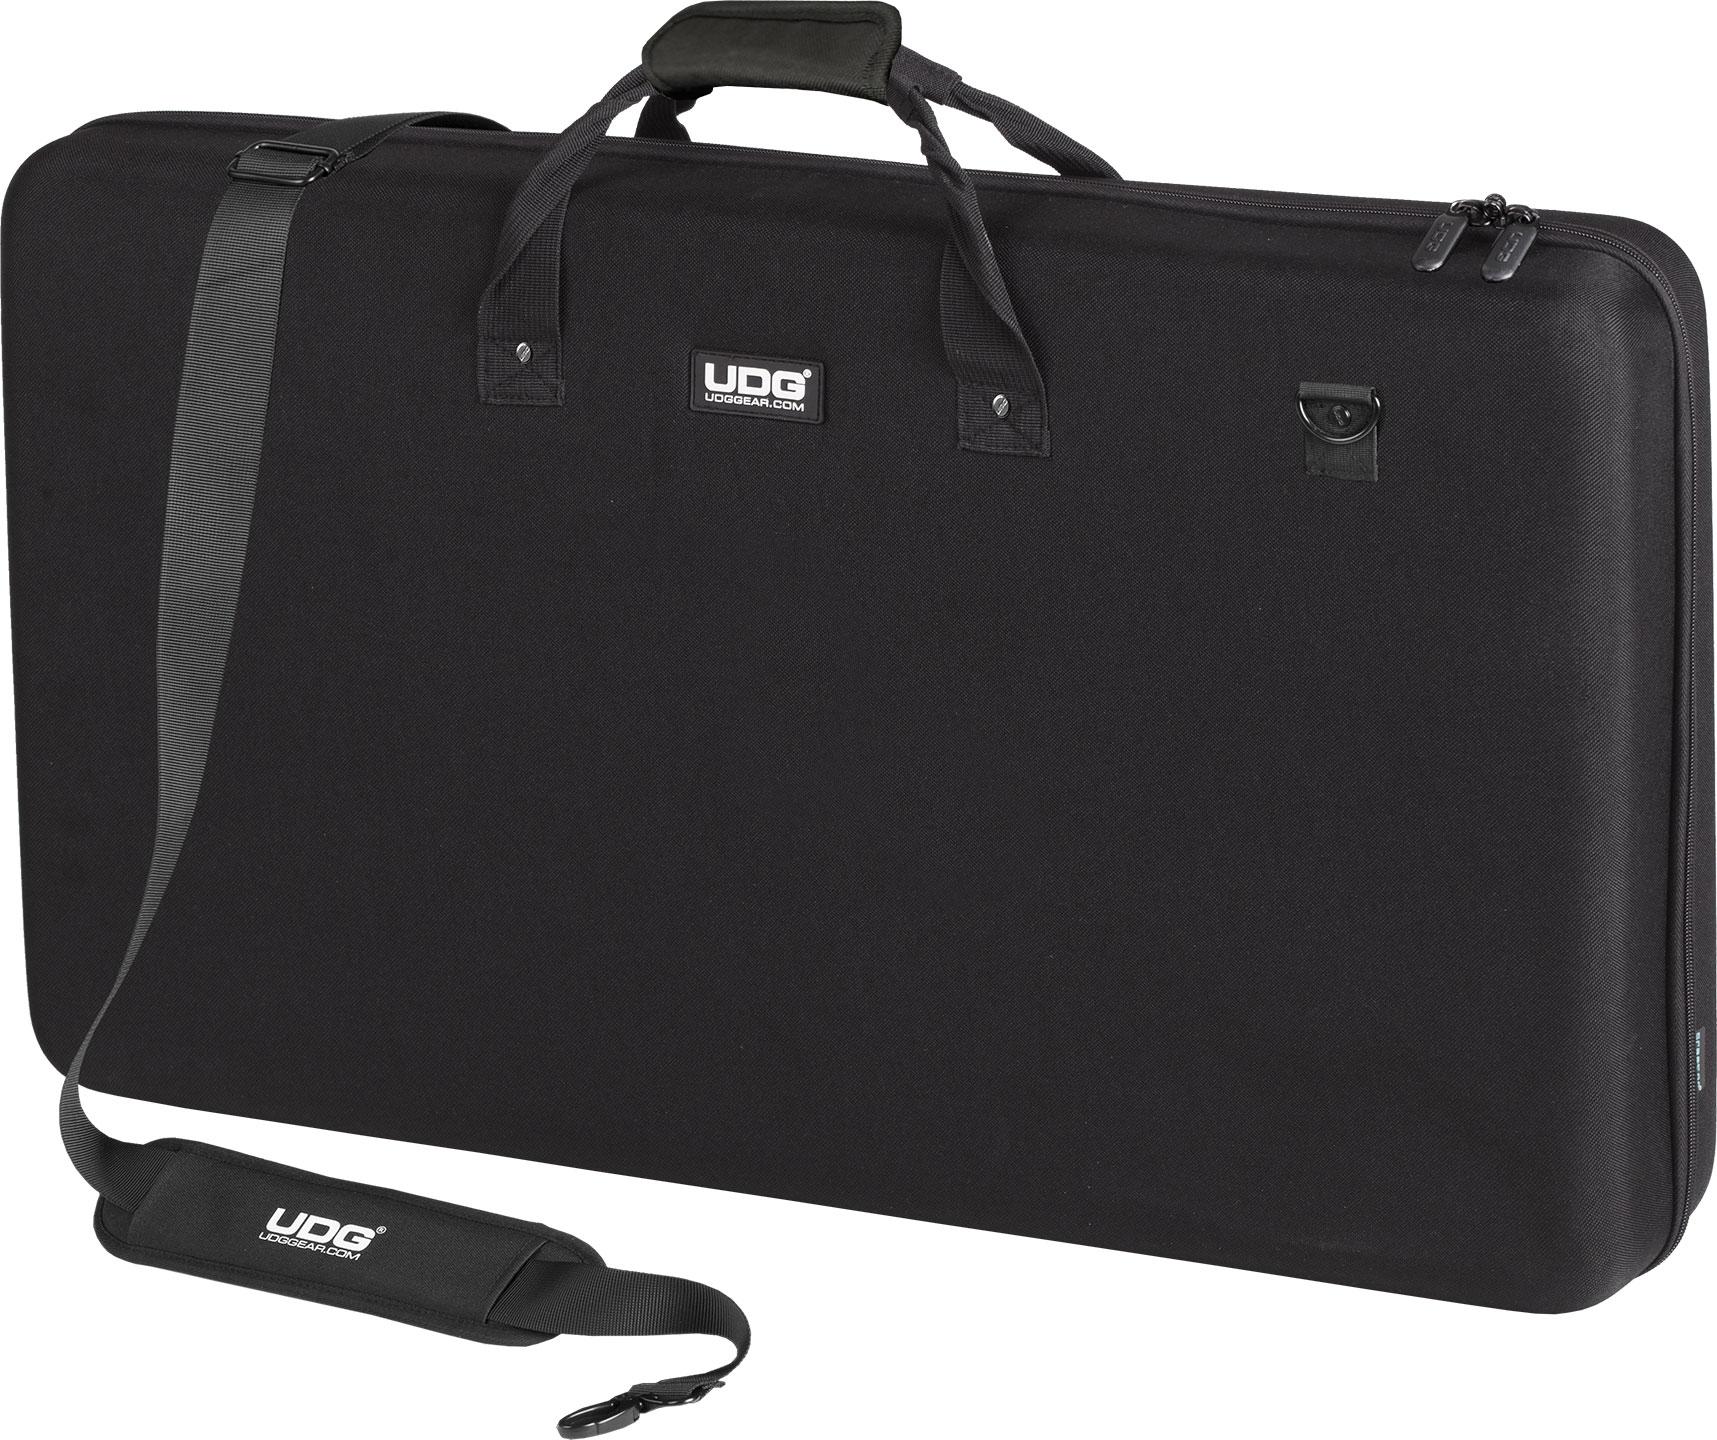 UDG Gear Creator Pioneer XDJ-RX2/Denon MCX8000 Hardcase Black